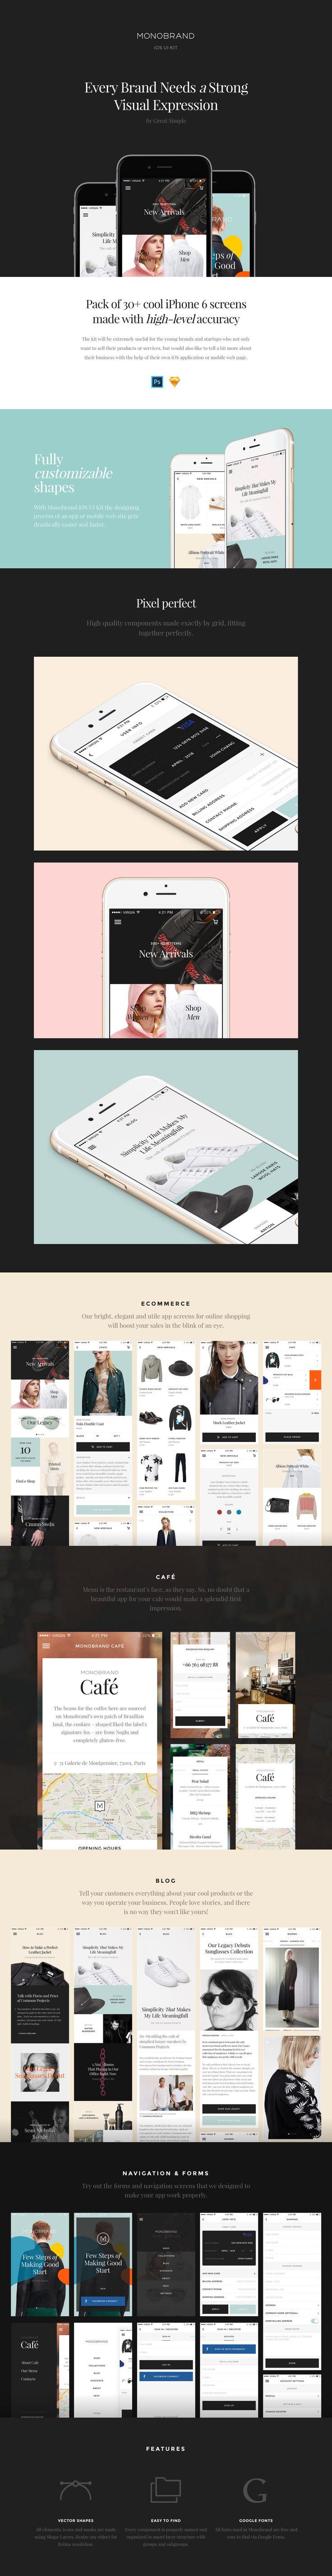 Monobrand iOS on Market (http://market.designmodo.com/monobrand-ios/)